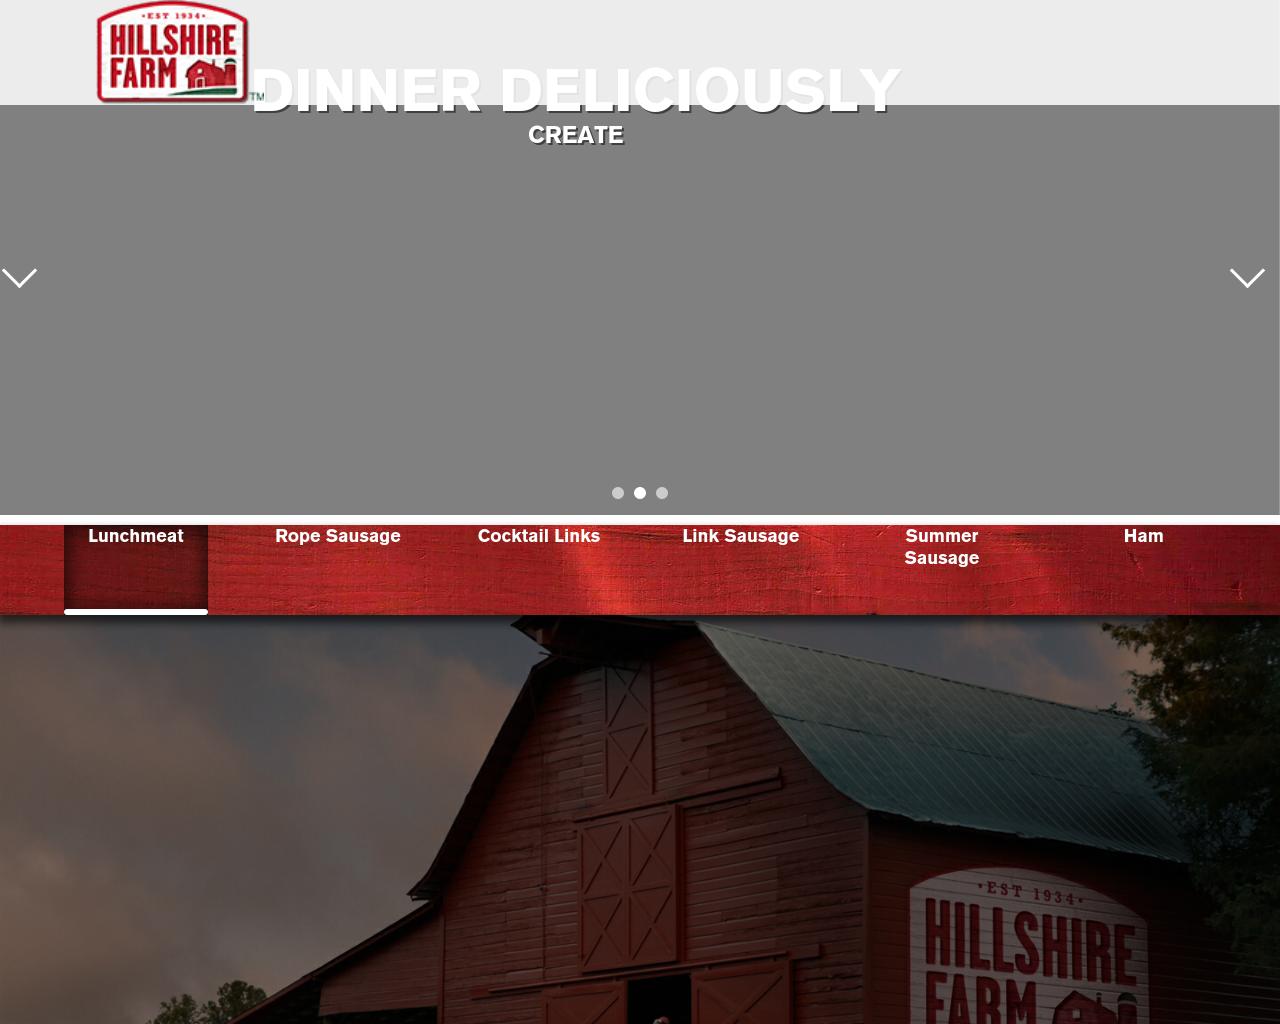 Hillshirefarm-Advertising-Reviews-Pricing